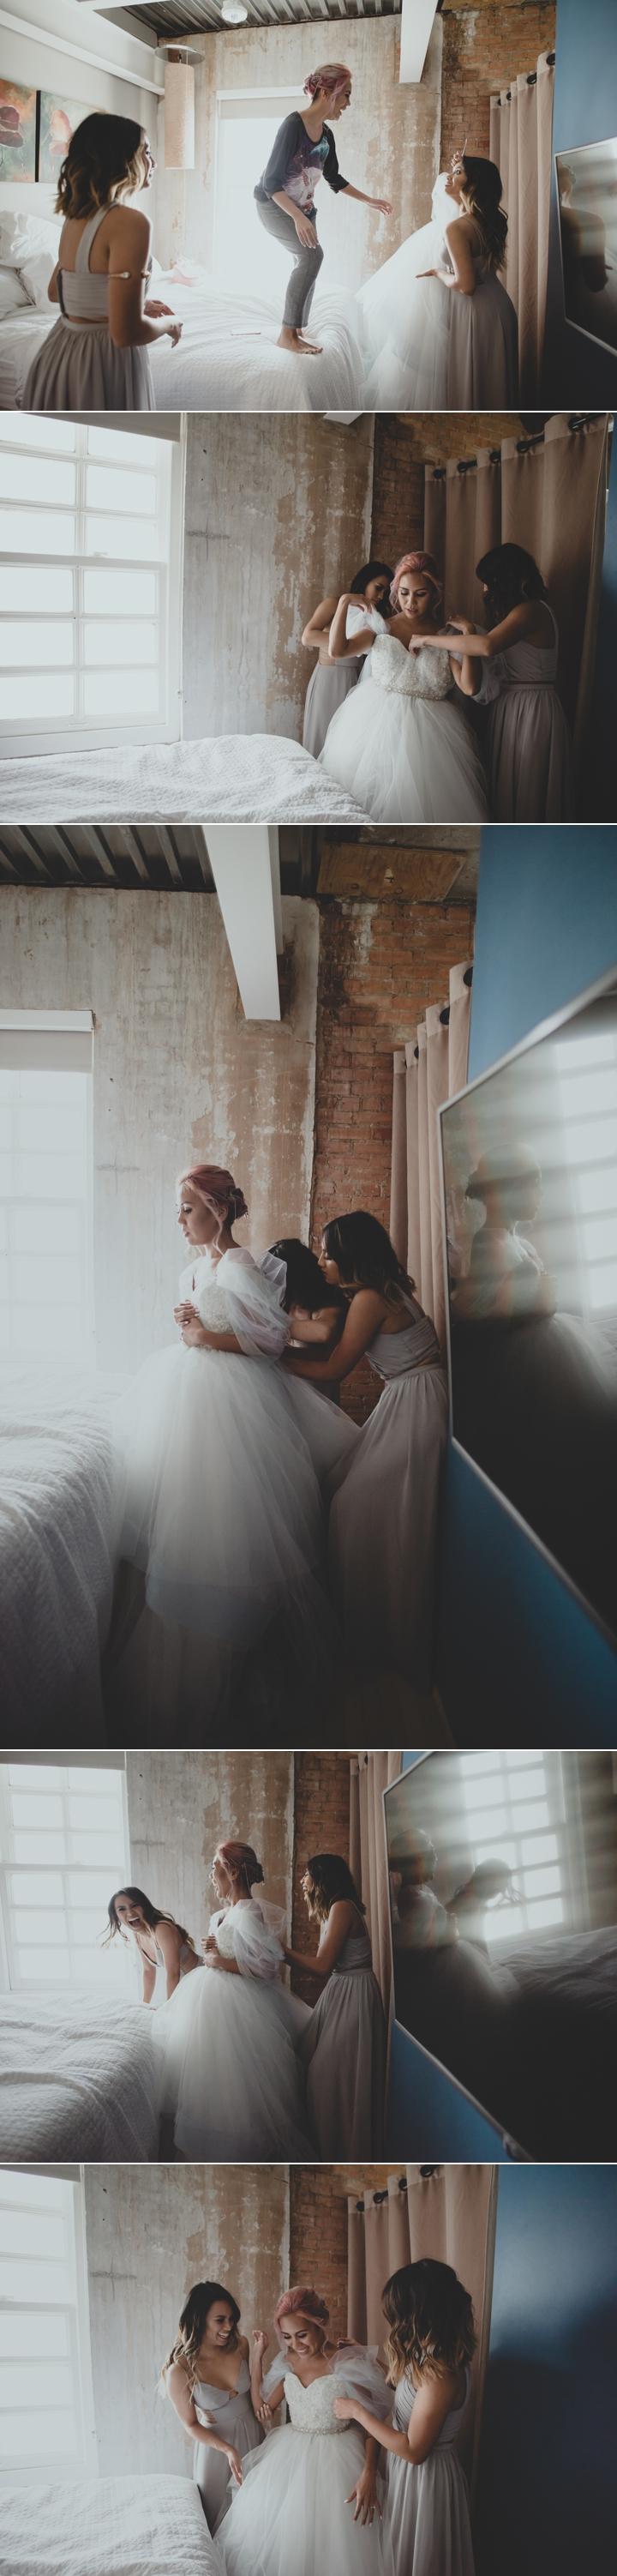 dallas-wedding-photographers-sj2 10.jpg